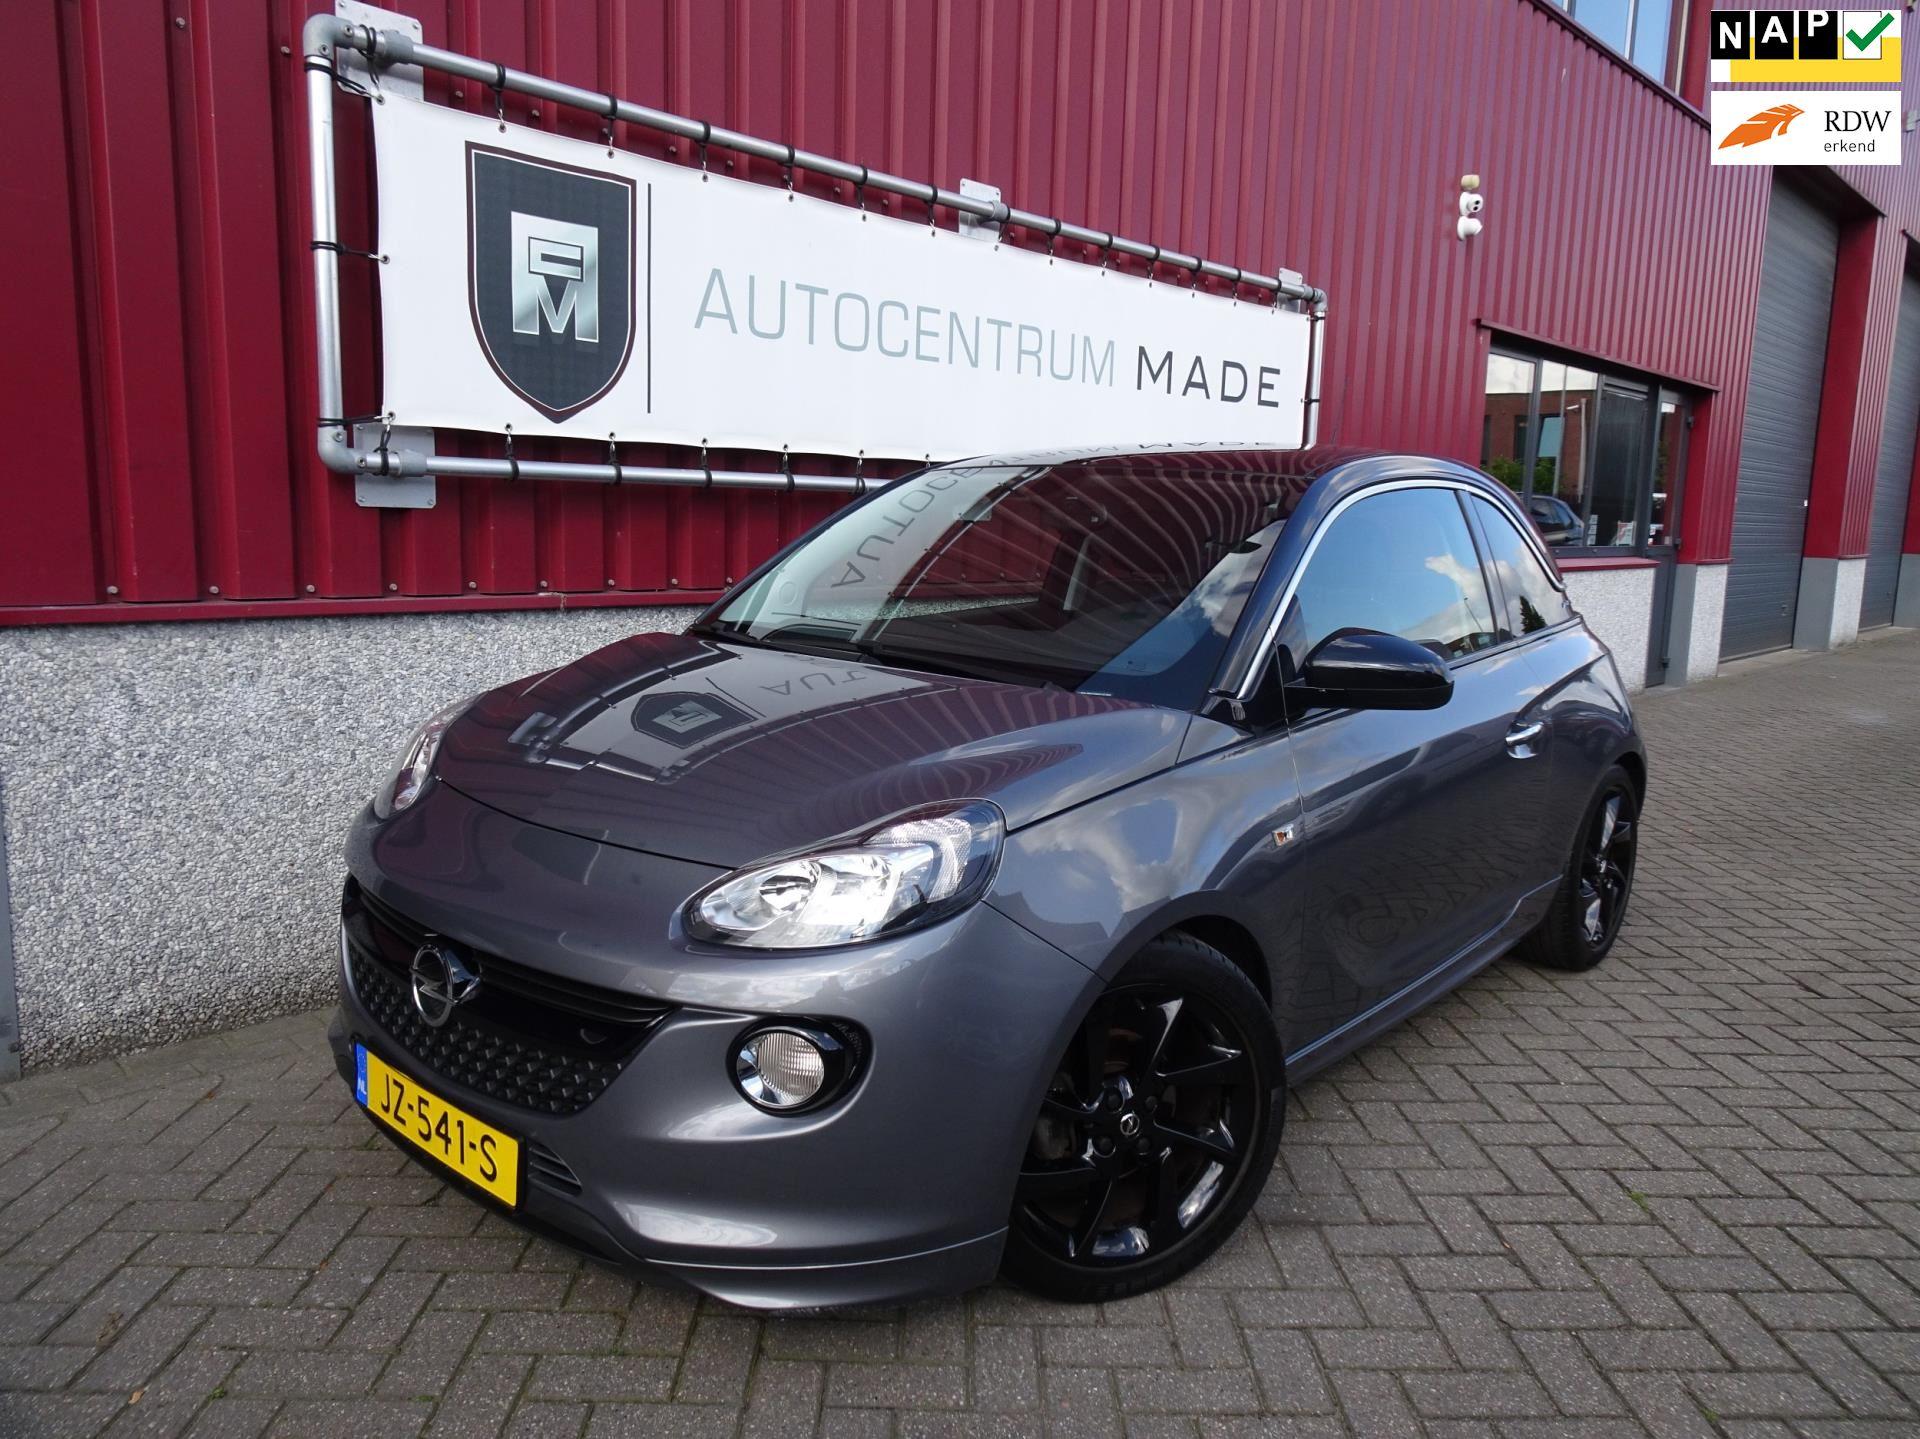 Opel ADAM occasion - Auto Centrum Made